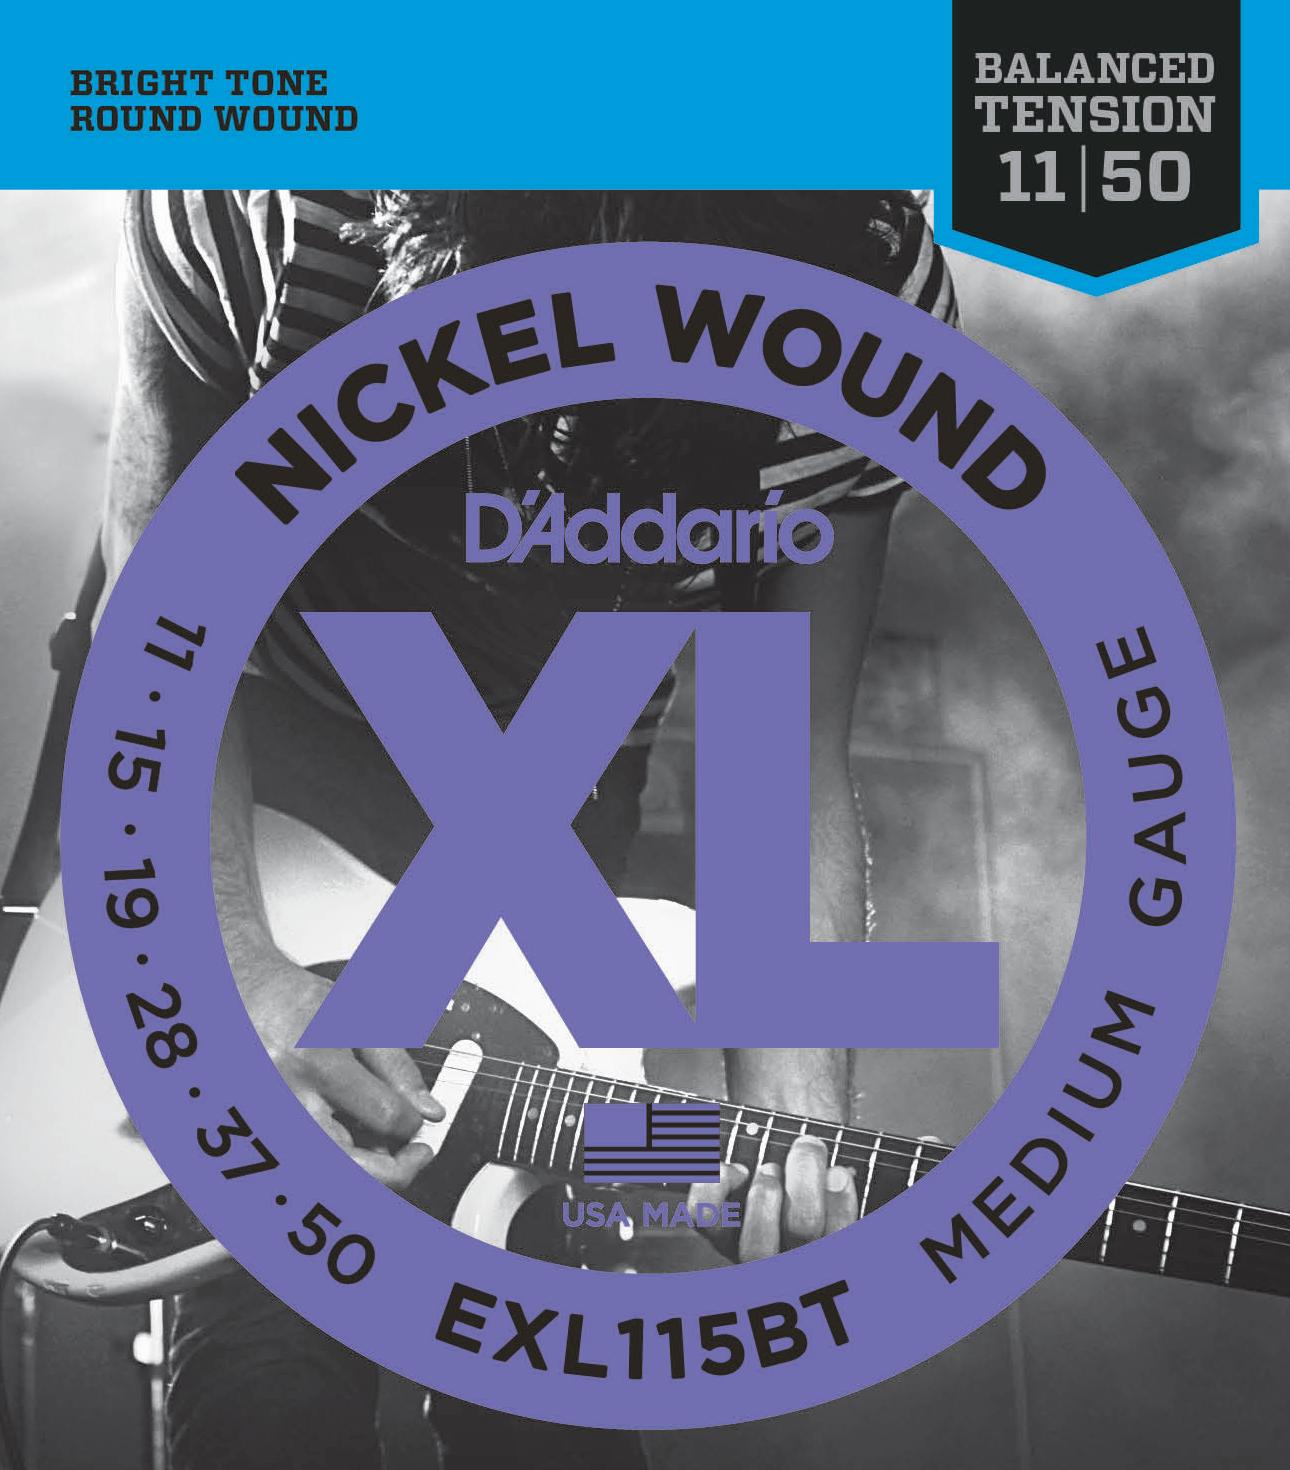 D'Addario EXL115BT Balanced Tension Electric Stringset